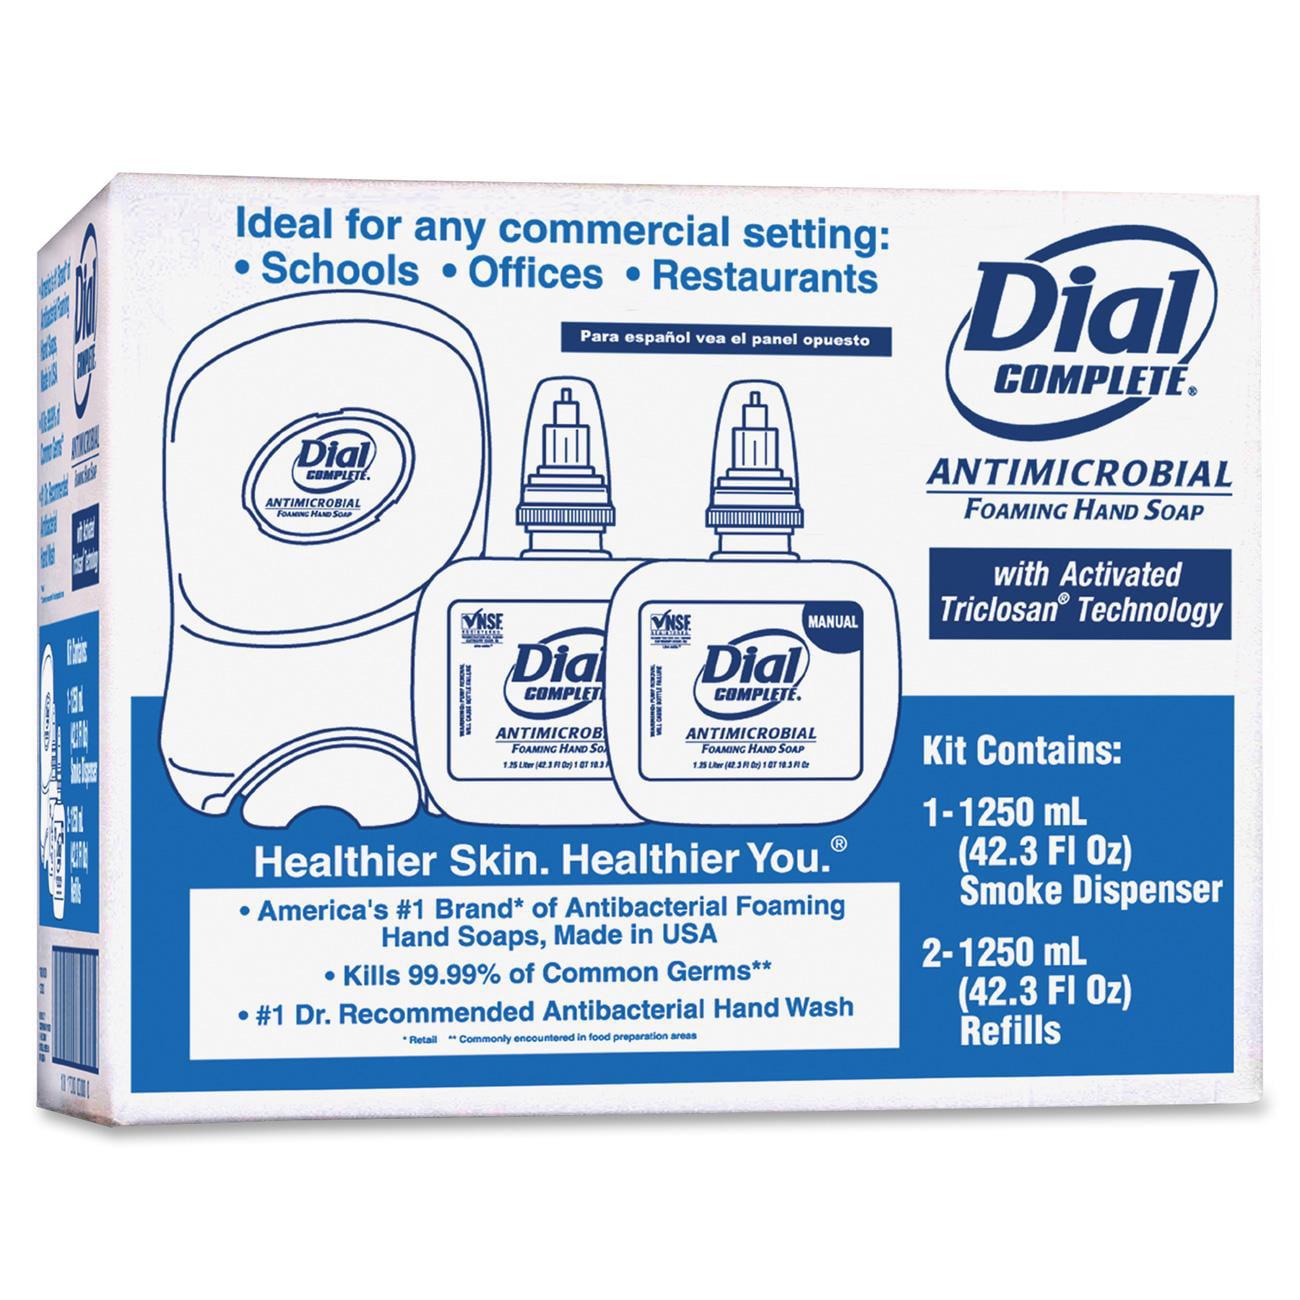 Dial Complete Foam Hand Soap Starter Kit